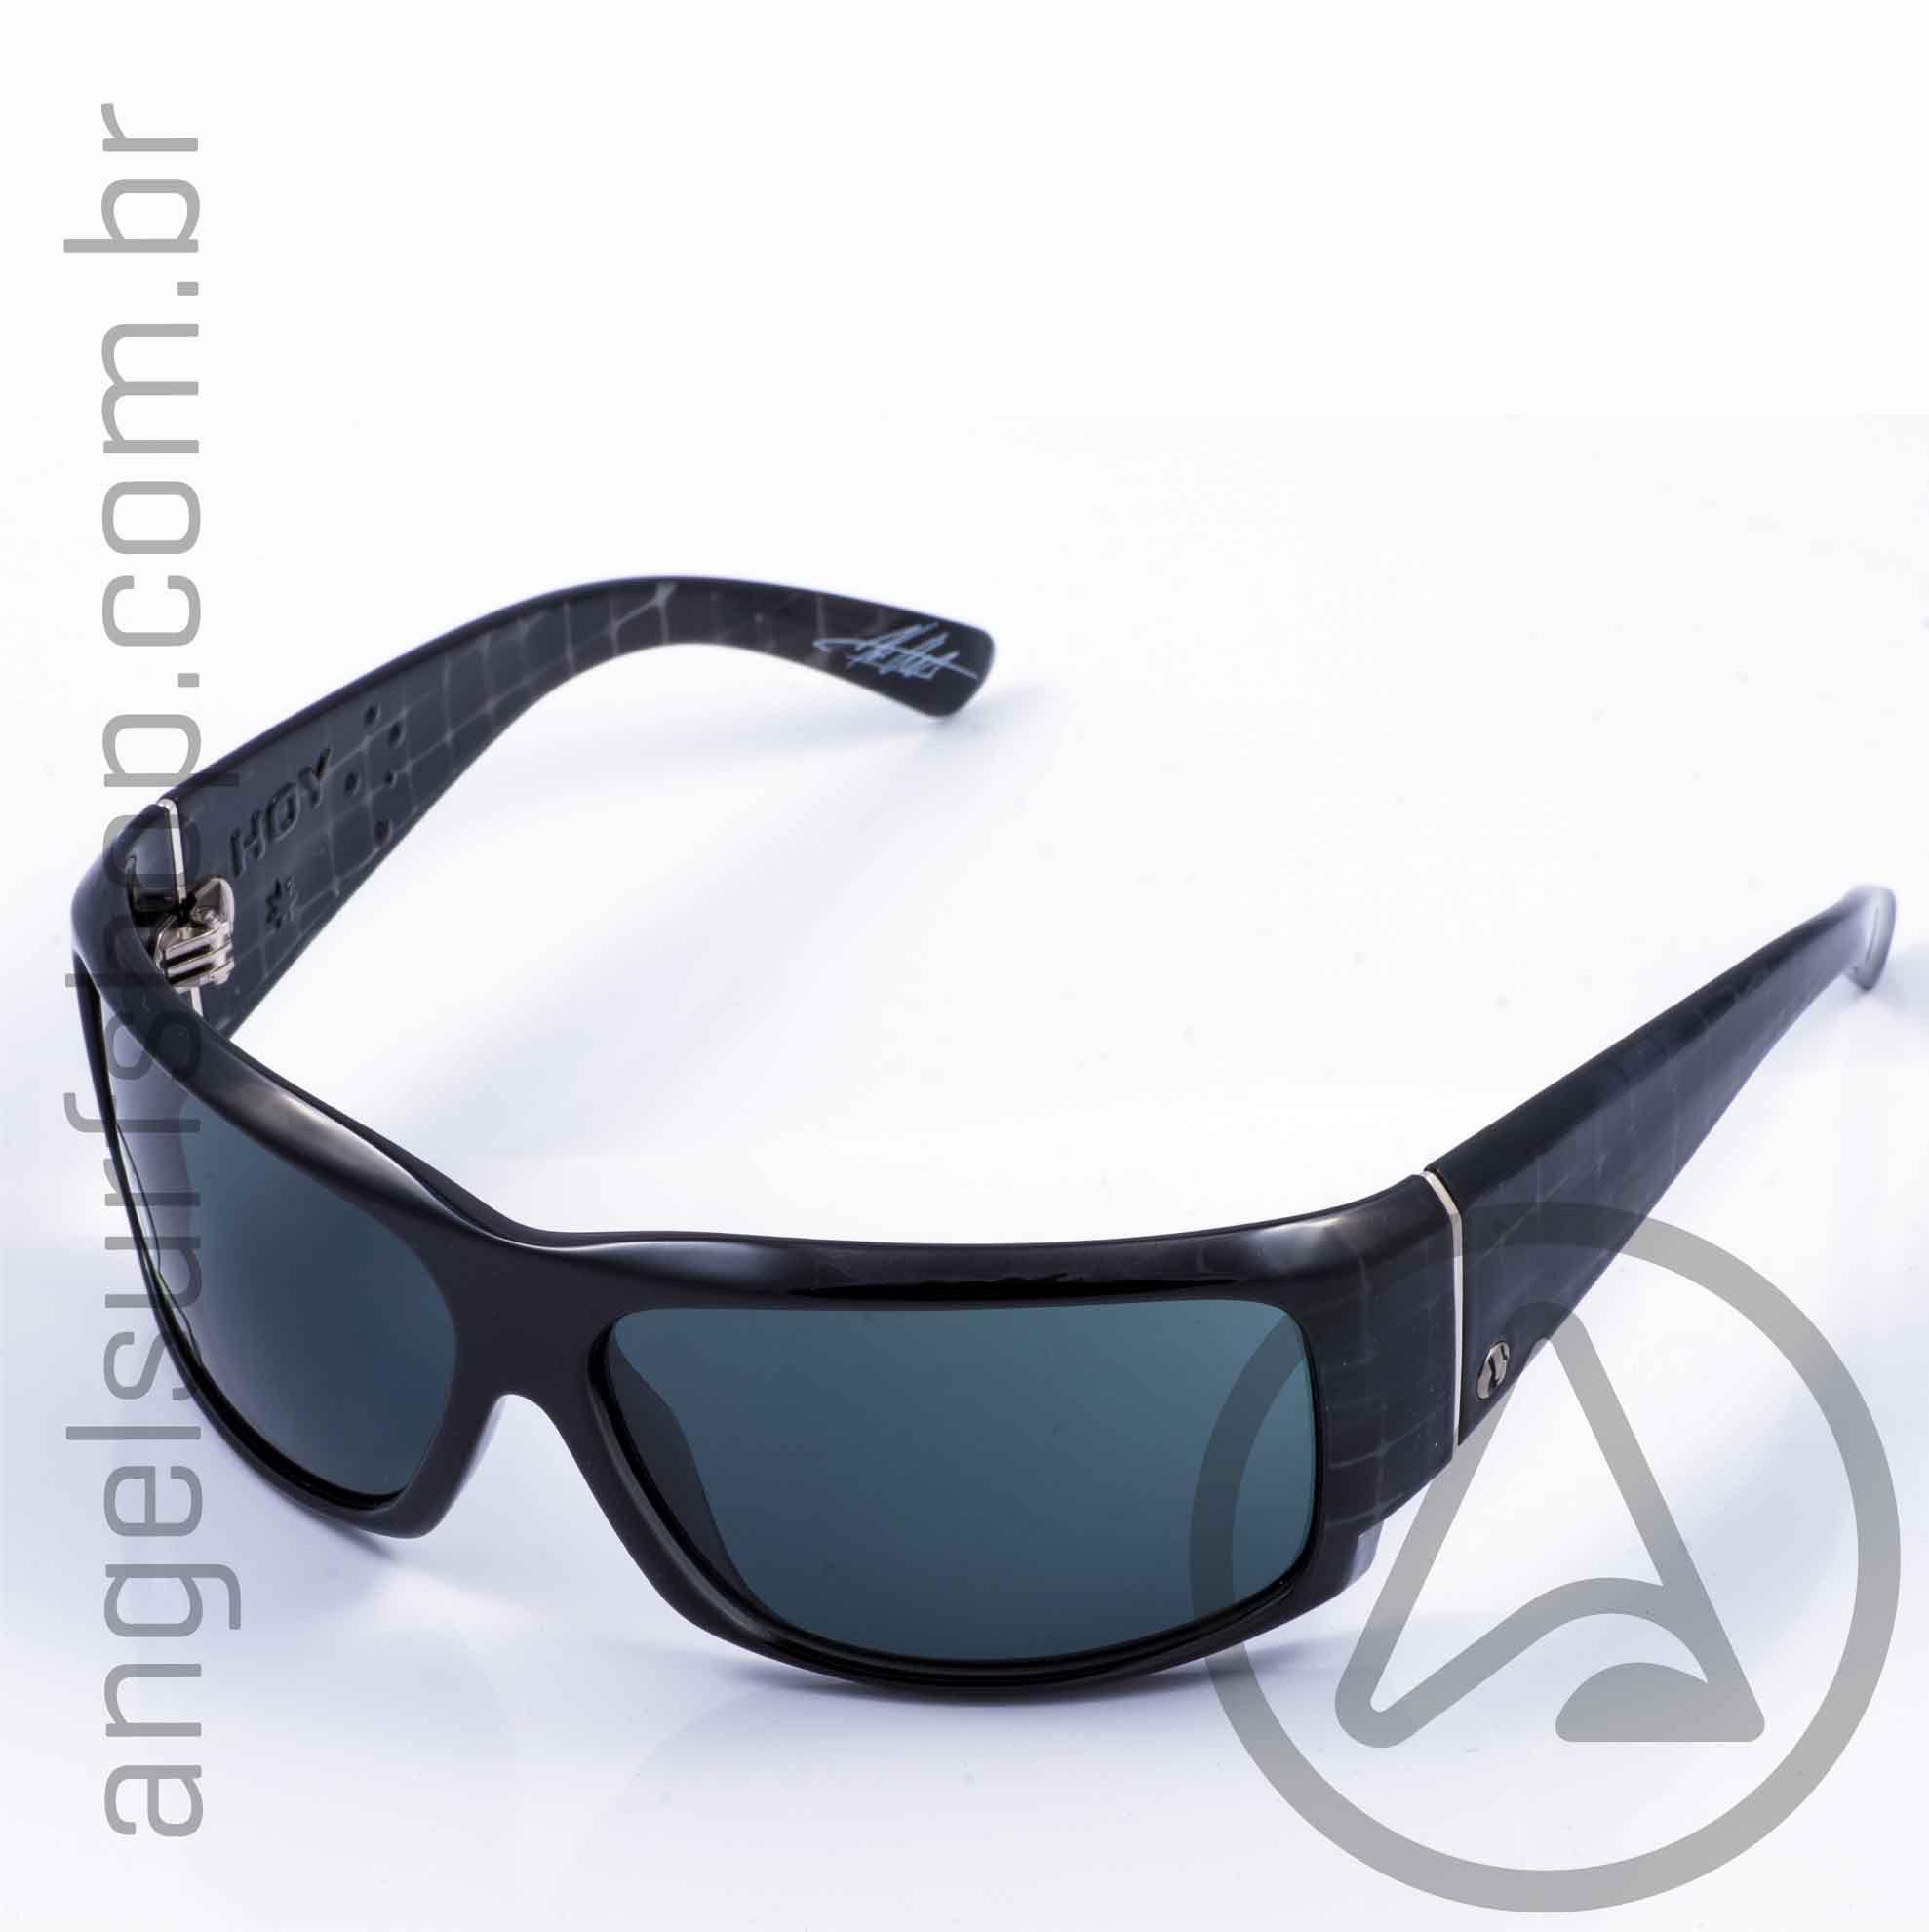 Sunglass Electric Hoy Black Box Grey